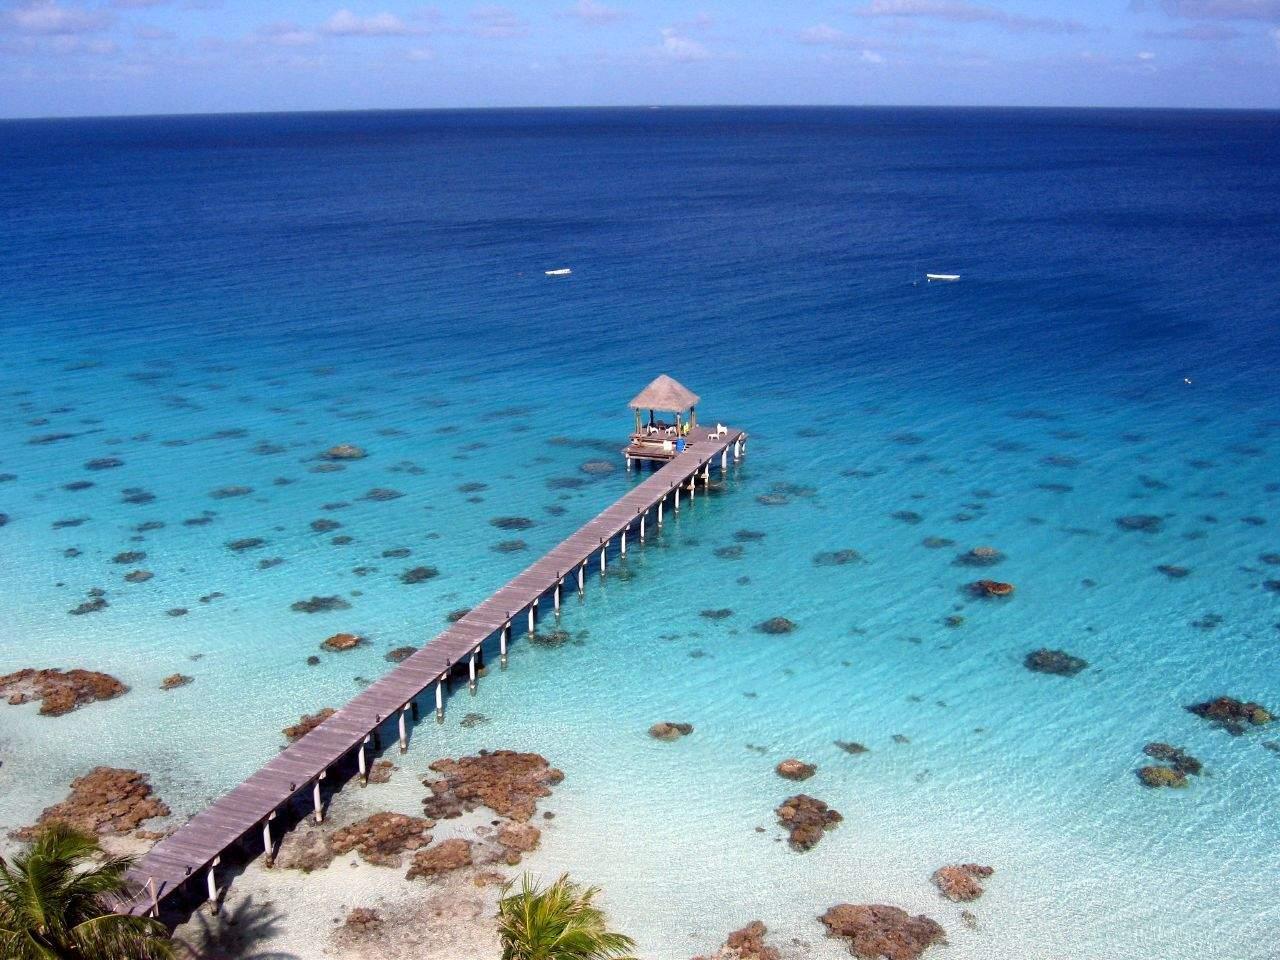 Maitai-Dream-Fakarava-Tuamotu-Archipelago-Aug-11-2007